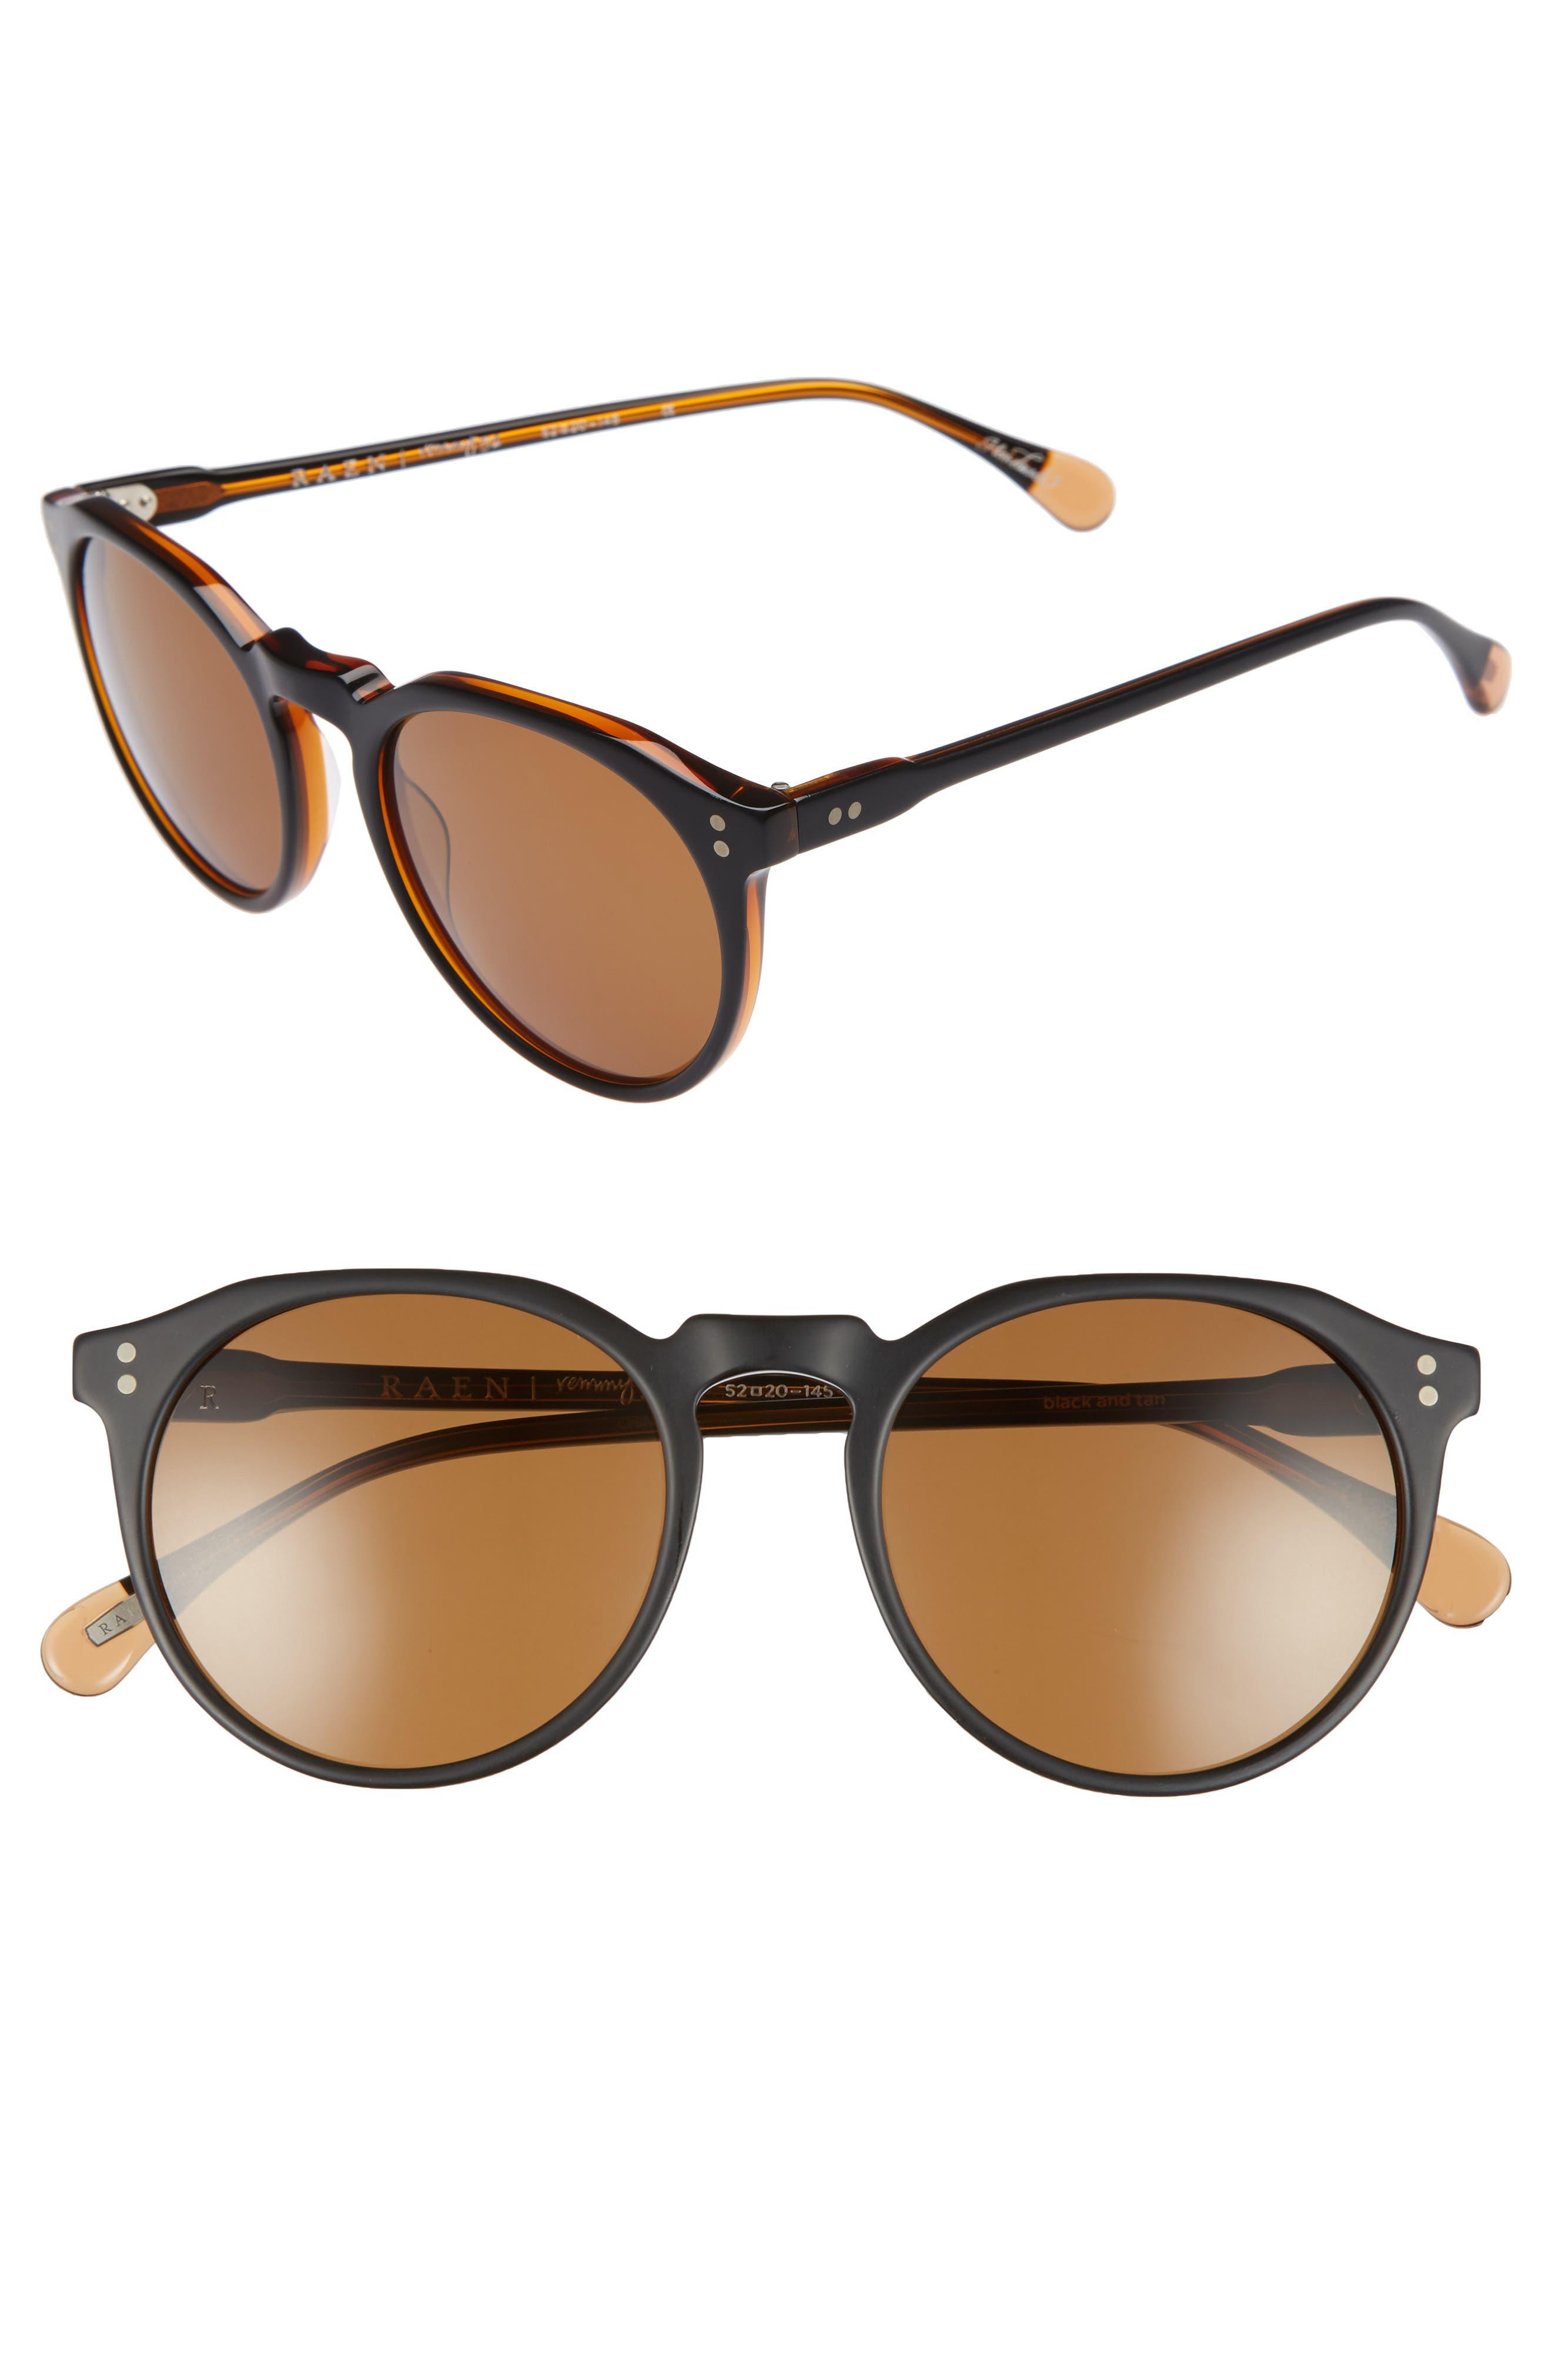 Remmy 52mm Sunglasses,                         Main,                         color, BLACK/ TAN/ BROWN